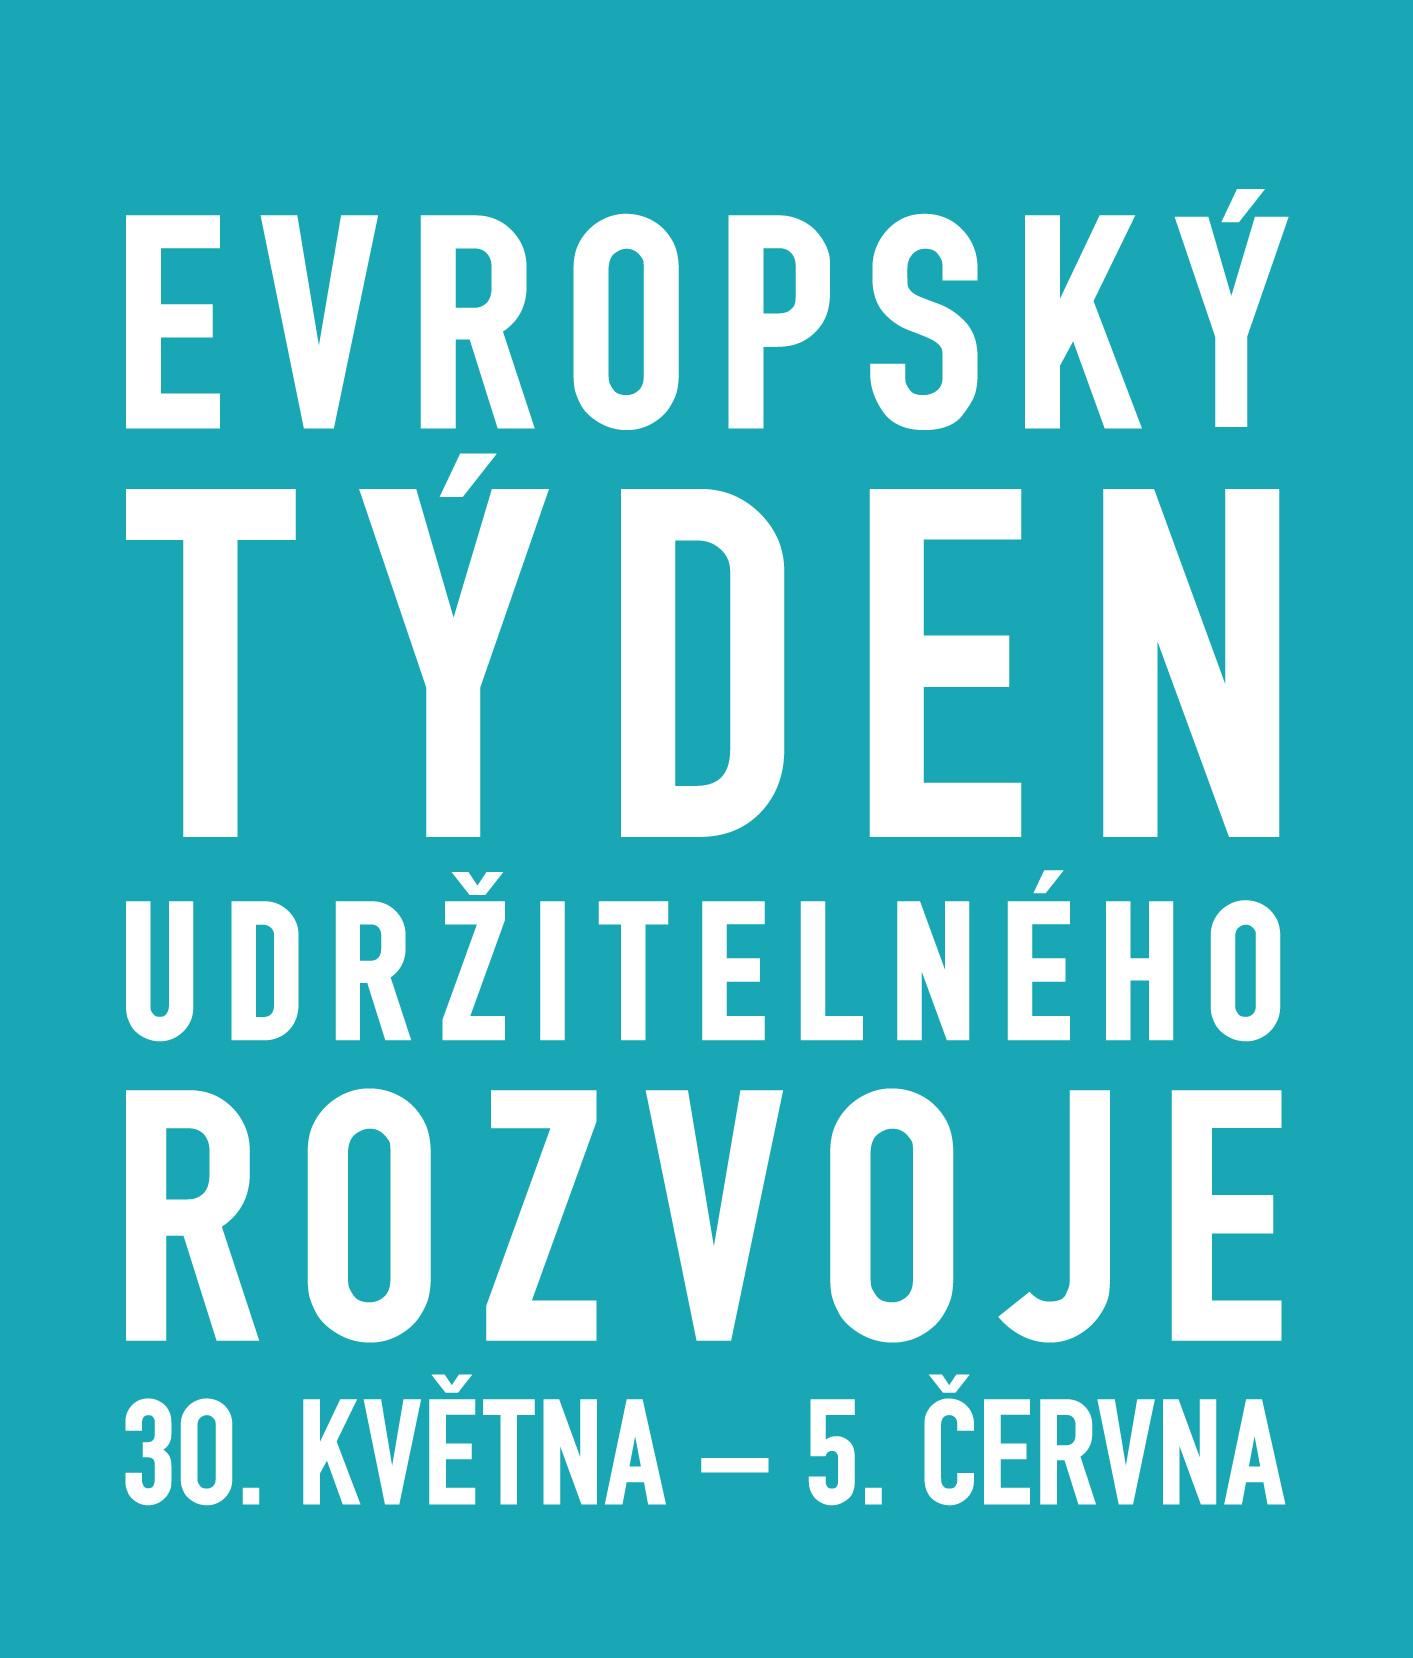 ETUR-logo-CZ-tyrkys